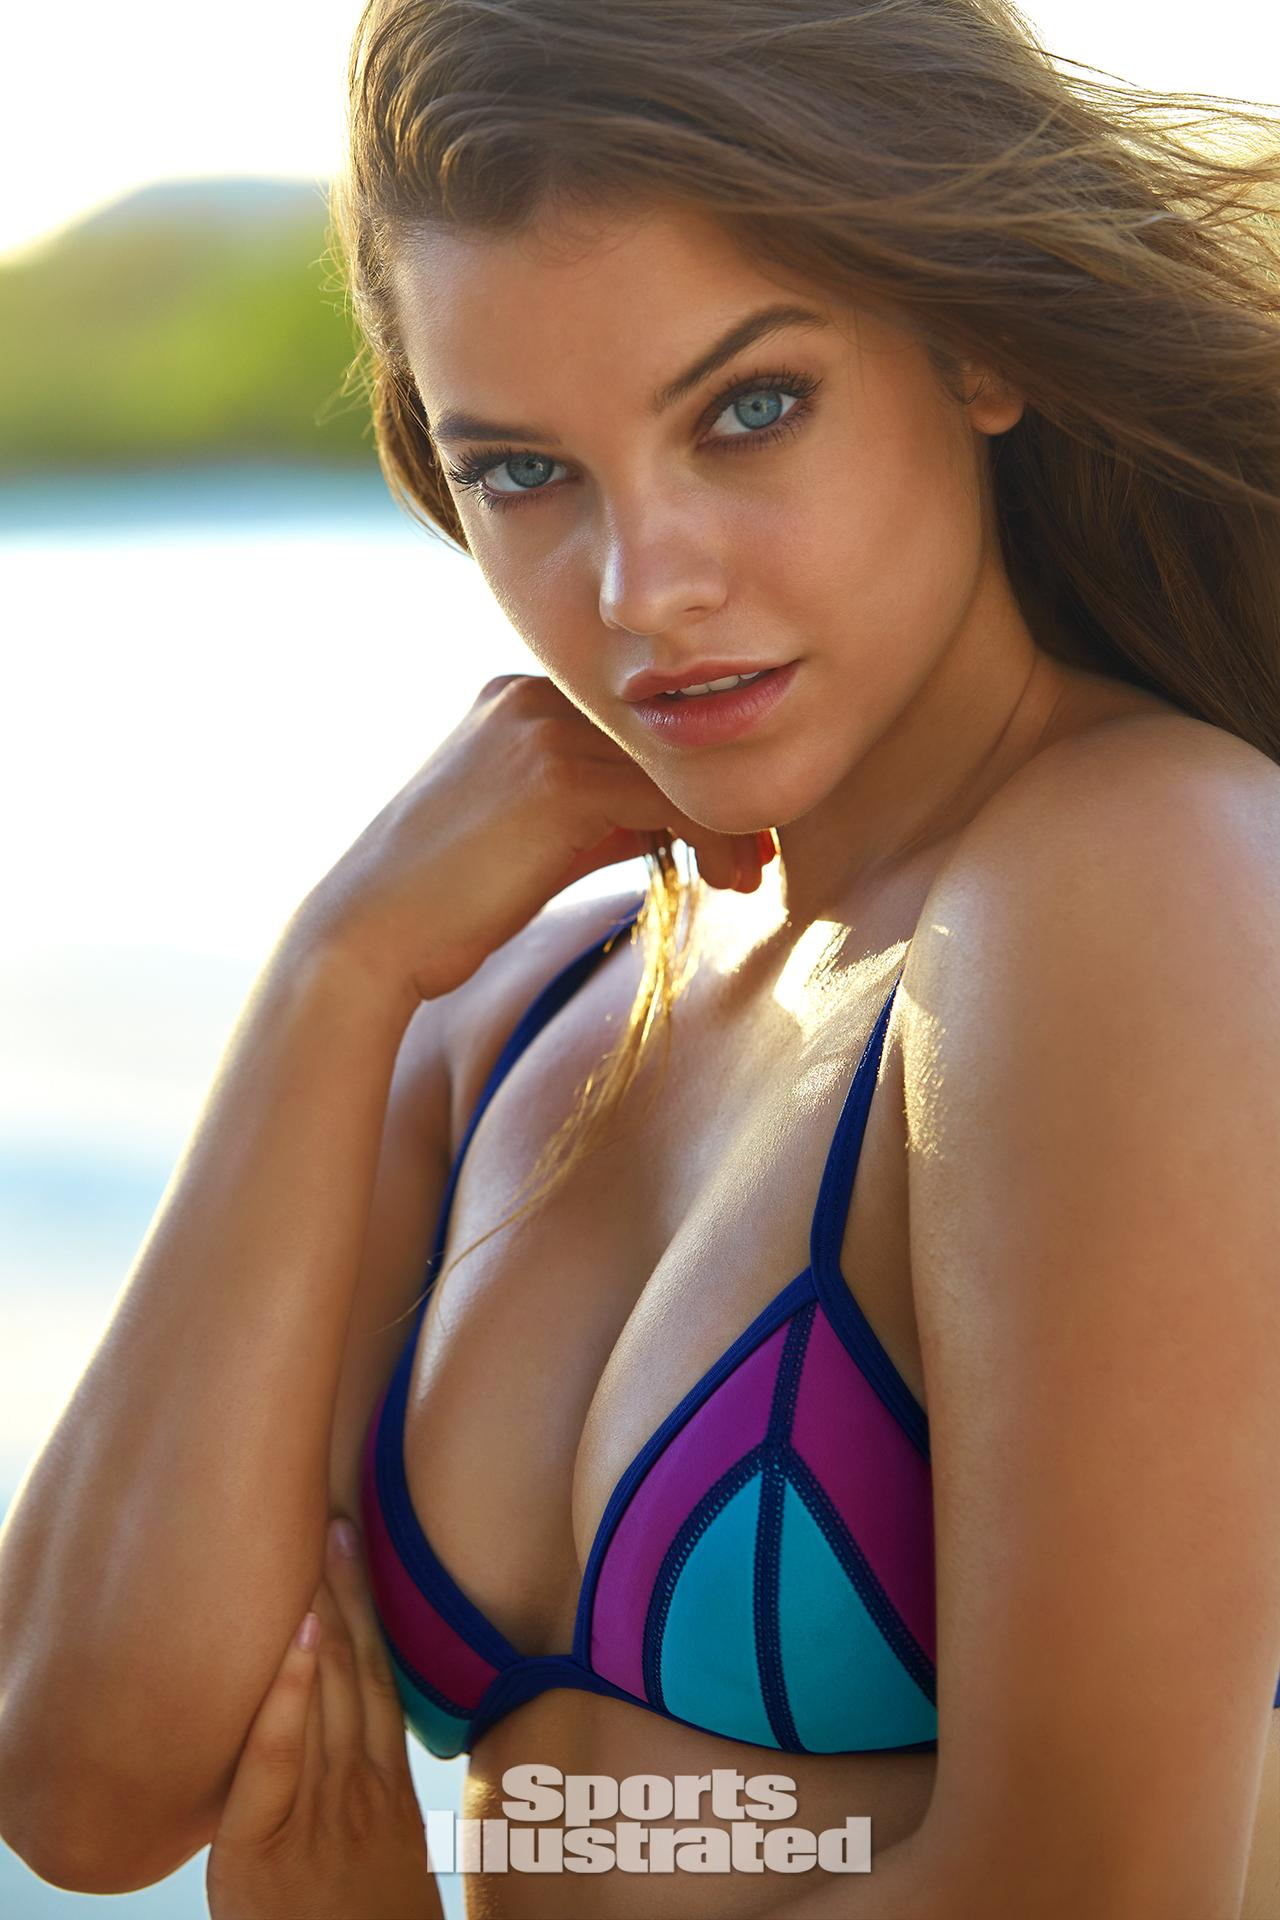 erin heatherton 2015 swimsuit bodypaint gallery | SI.com